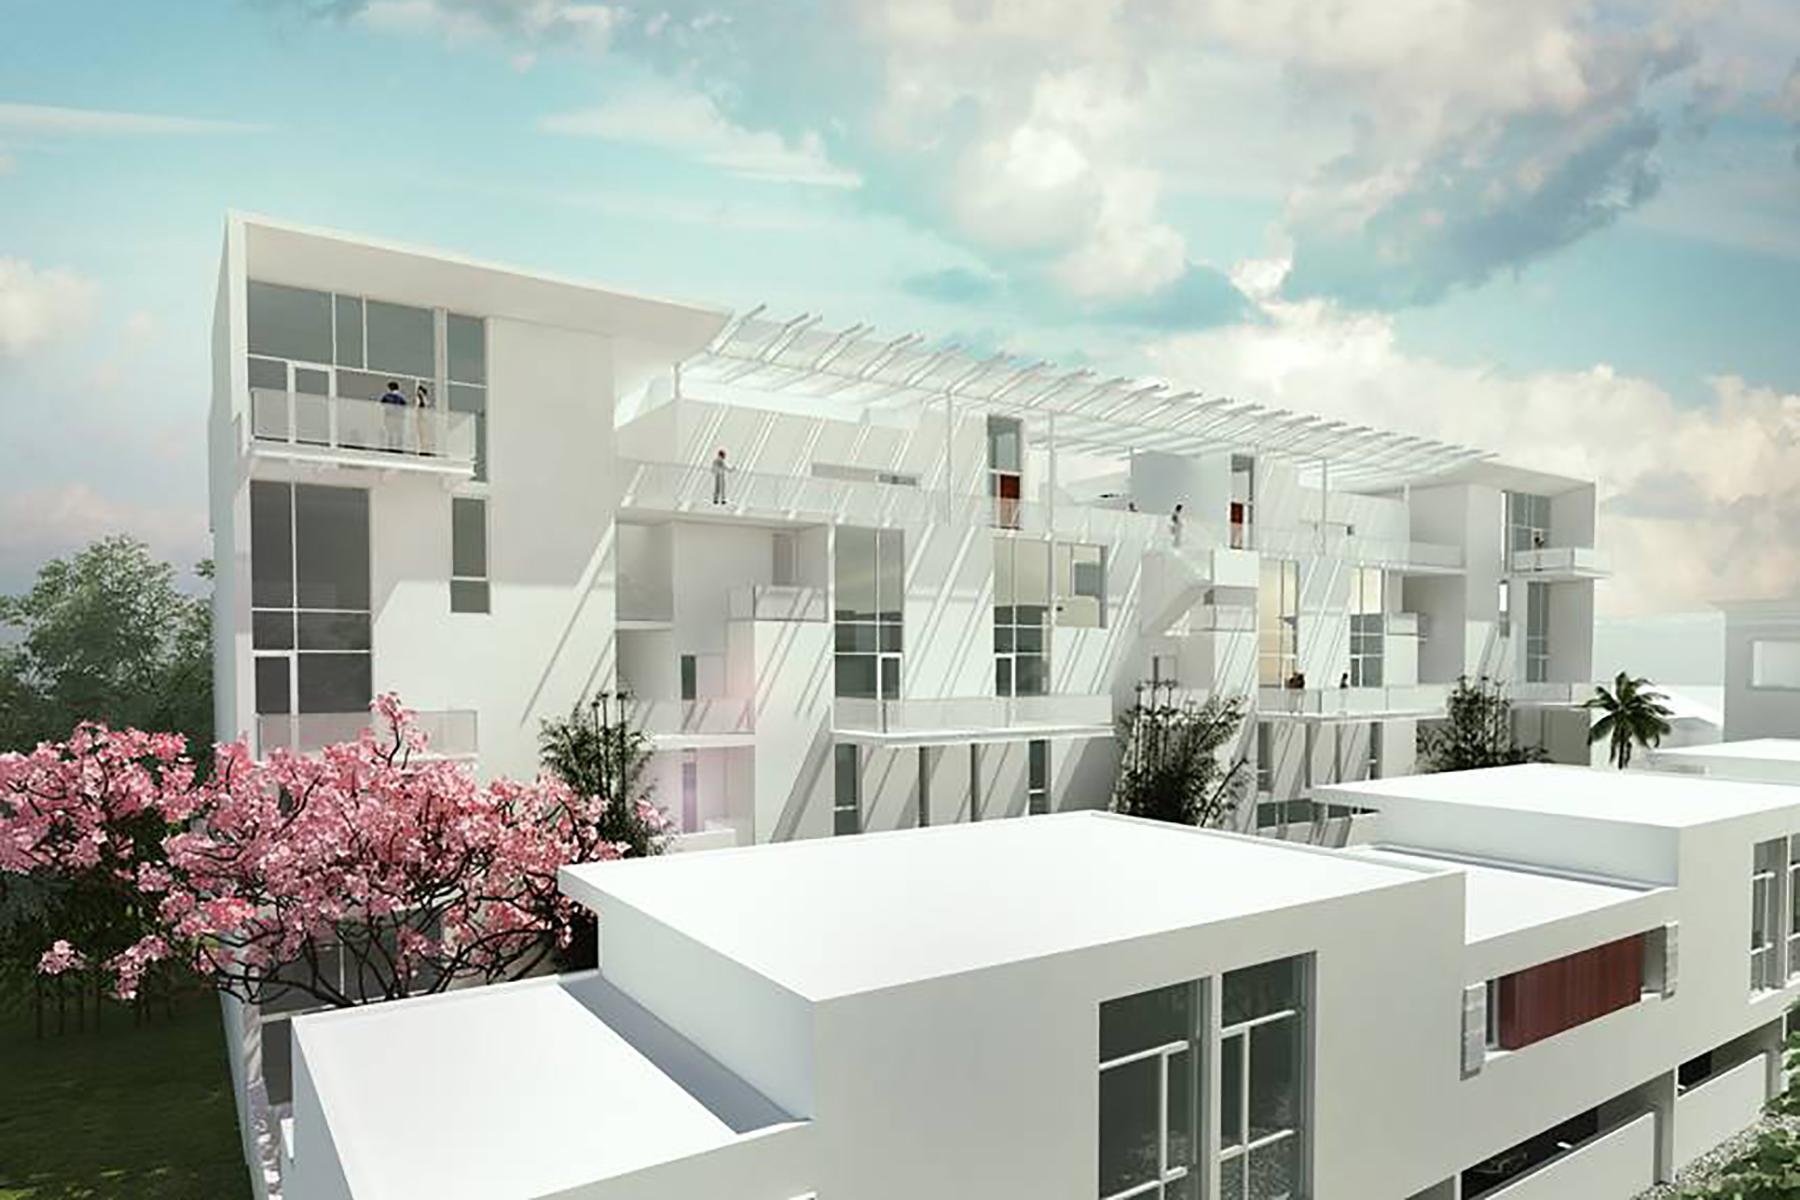 Condominium for Sale at RISDON ON 5TH 1350 5th St 204, Sarasota, Florida, 34236 United States